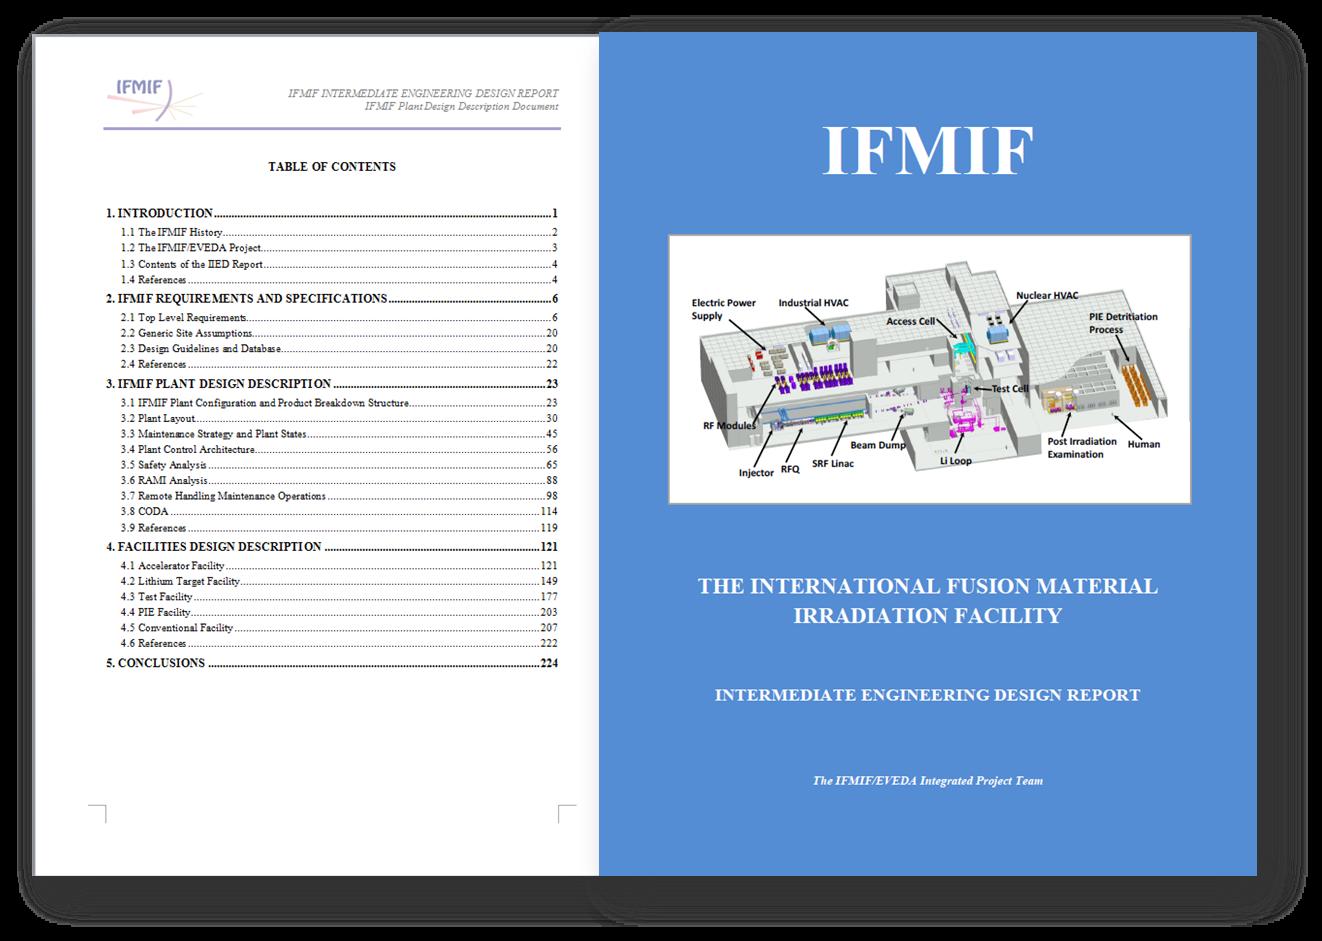 IFMIF-IIEDR2